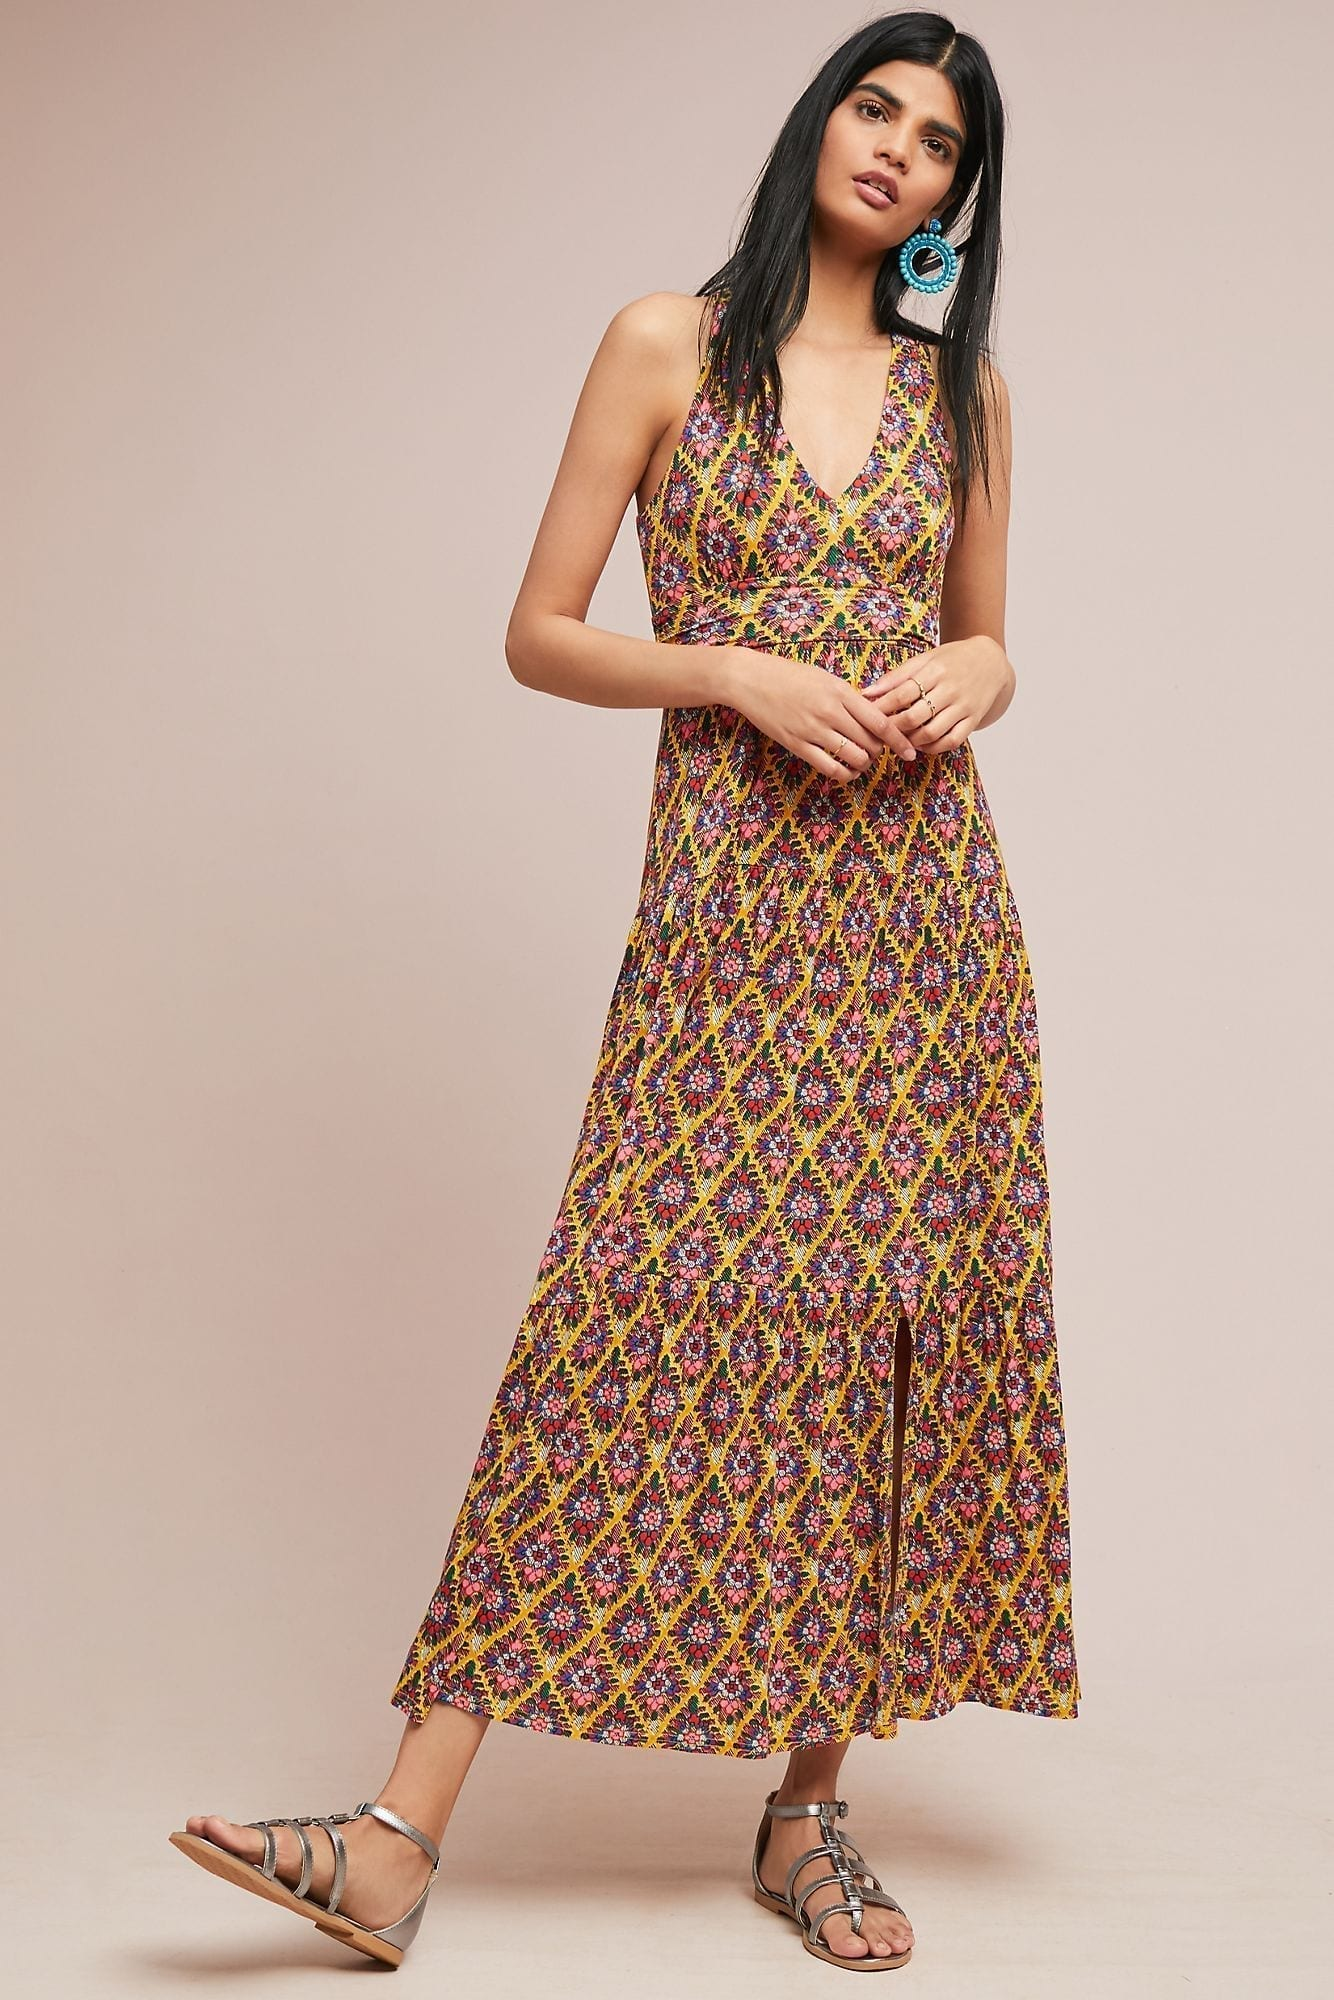 feed86a7929f MAEVE Luella Maxi Yellow Dress - We Select Dresses